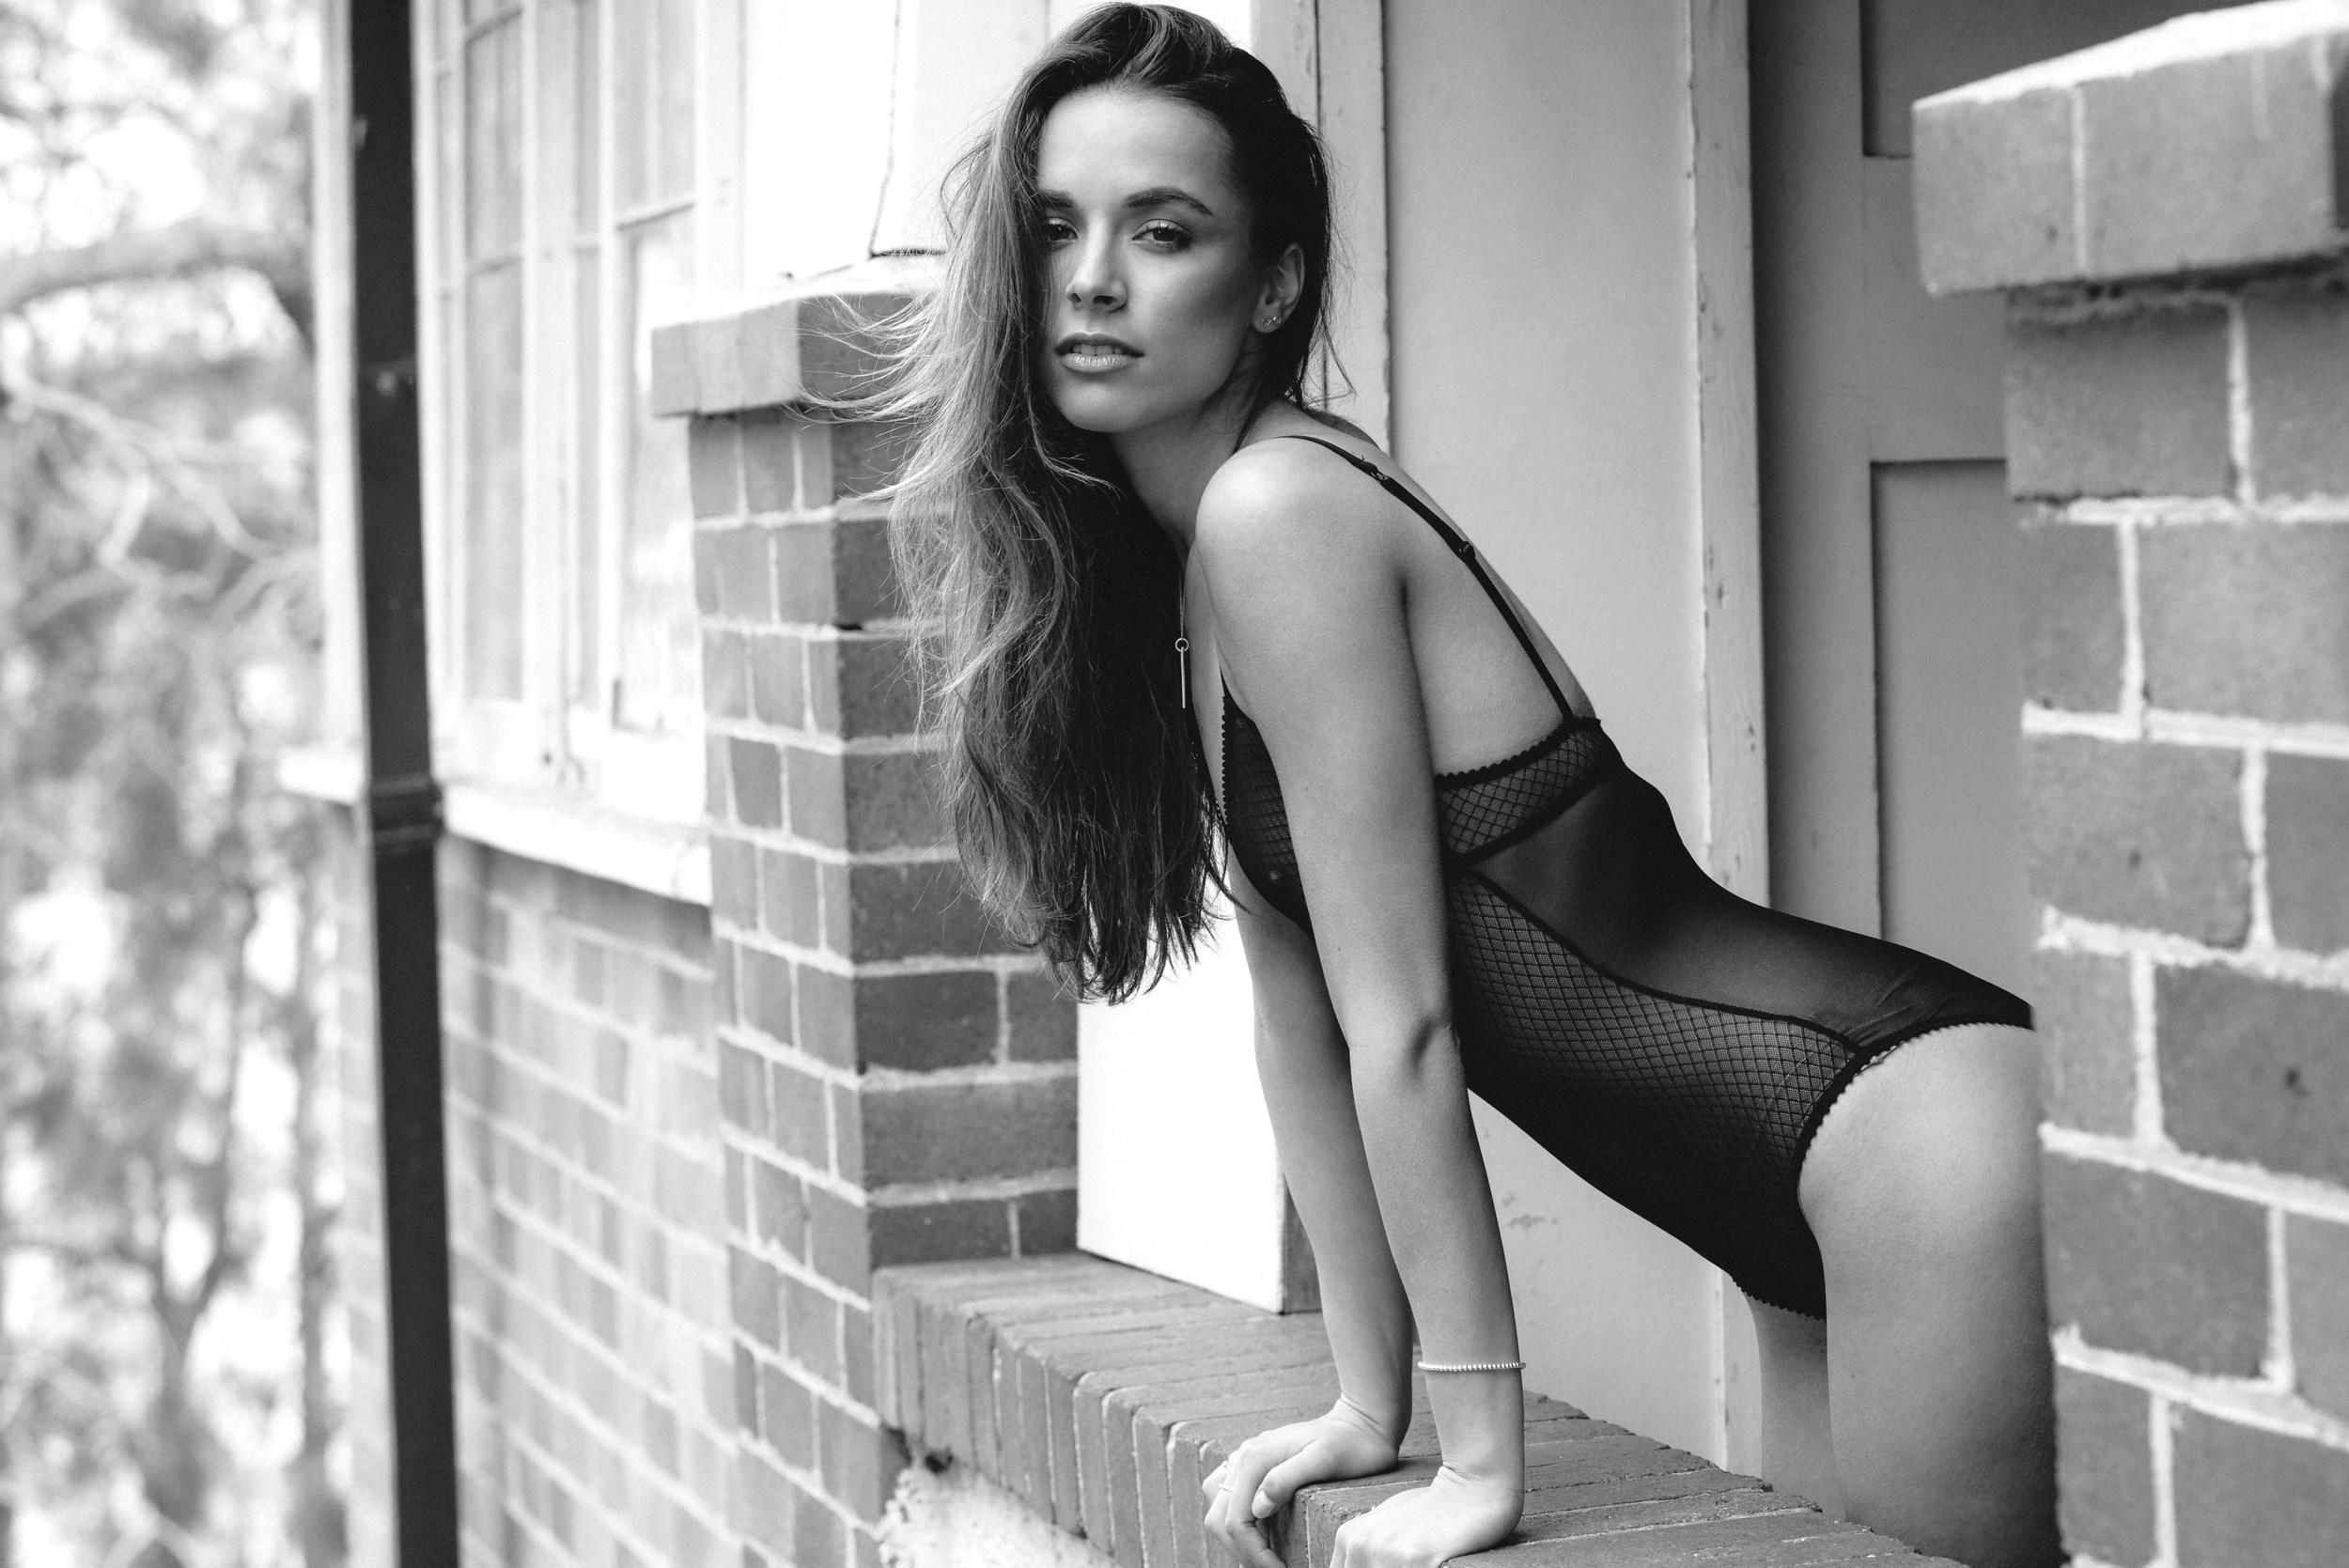 Hot Monika Radulovic nude photos 2019